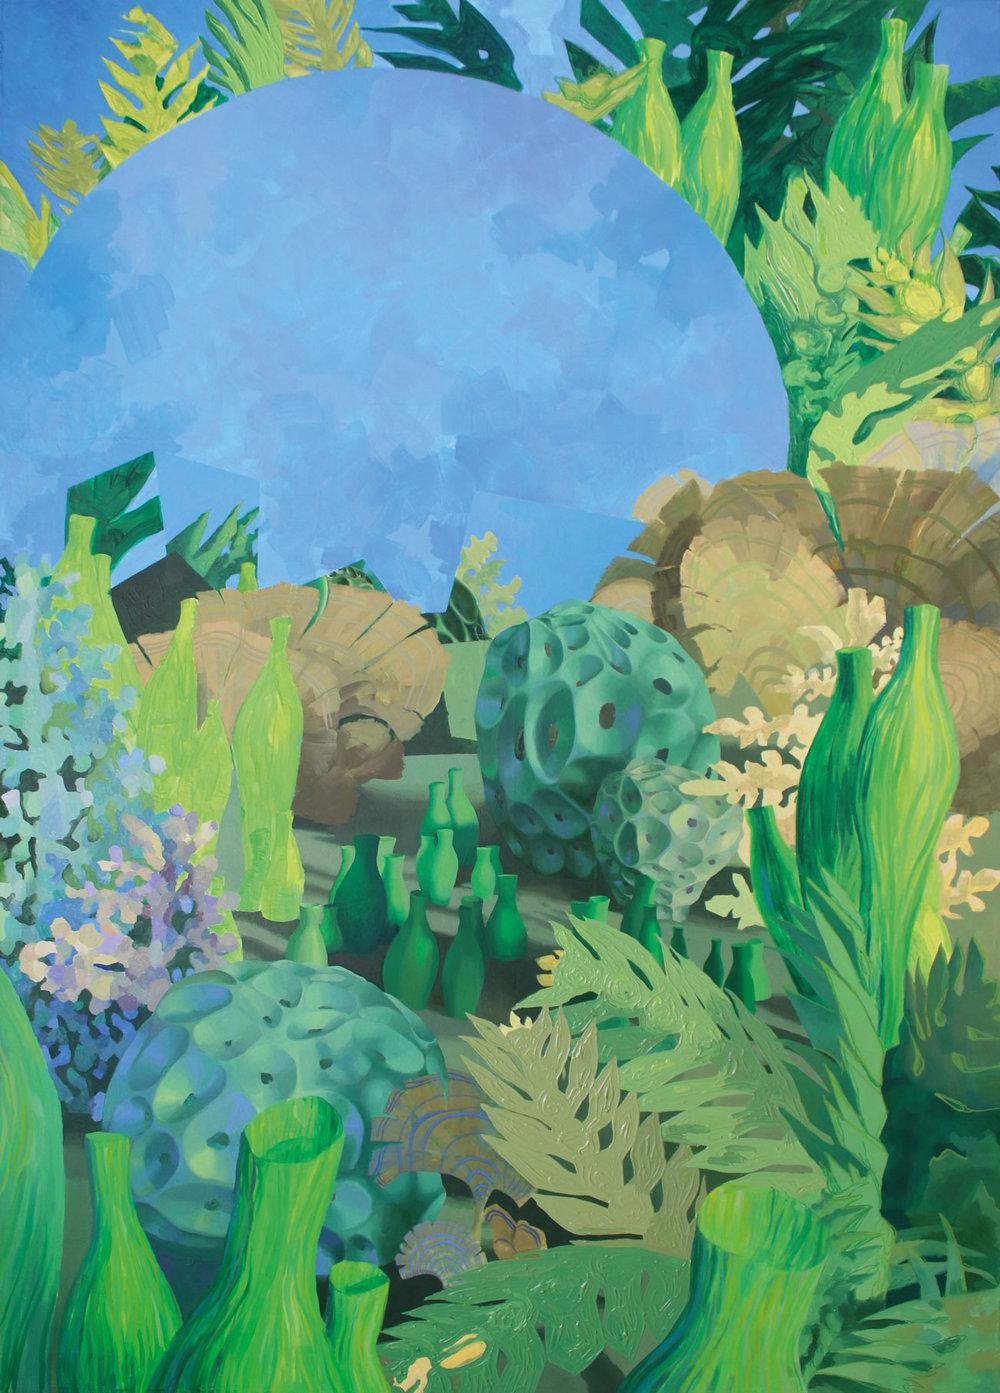 Biotopie  - 2018 - Acrylic, oil and pen on canvas - 120x 170 cm